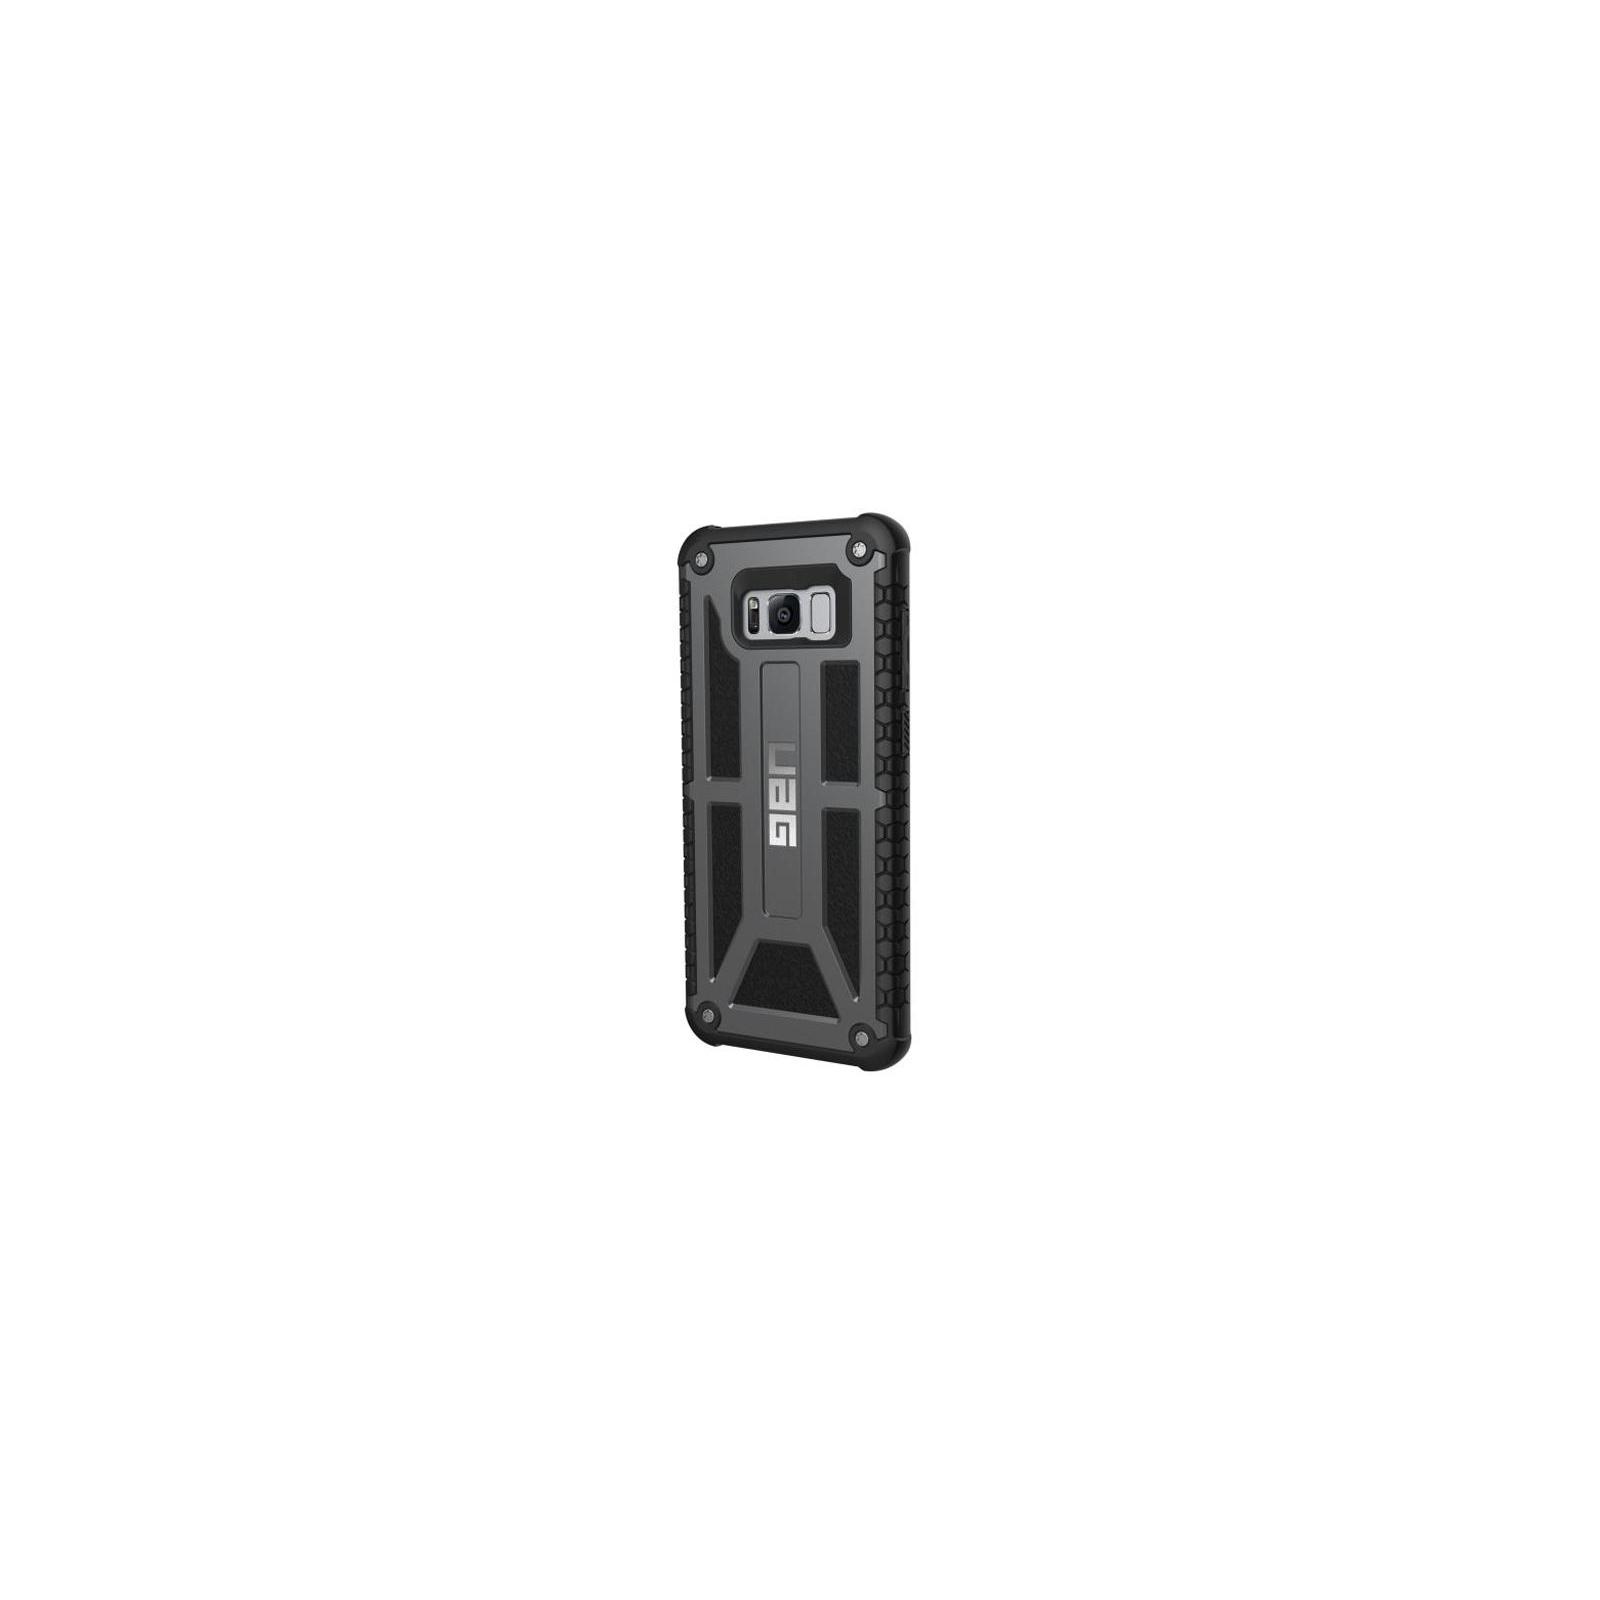 Чехол для моб. телефона Uag Galaxy S8 + Monarch Graphite (GLXS8PLS-M-GR) изображение 2